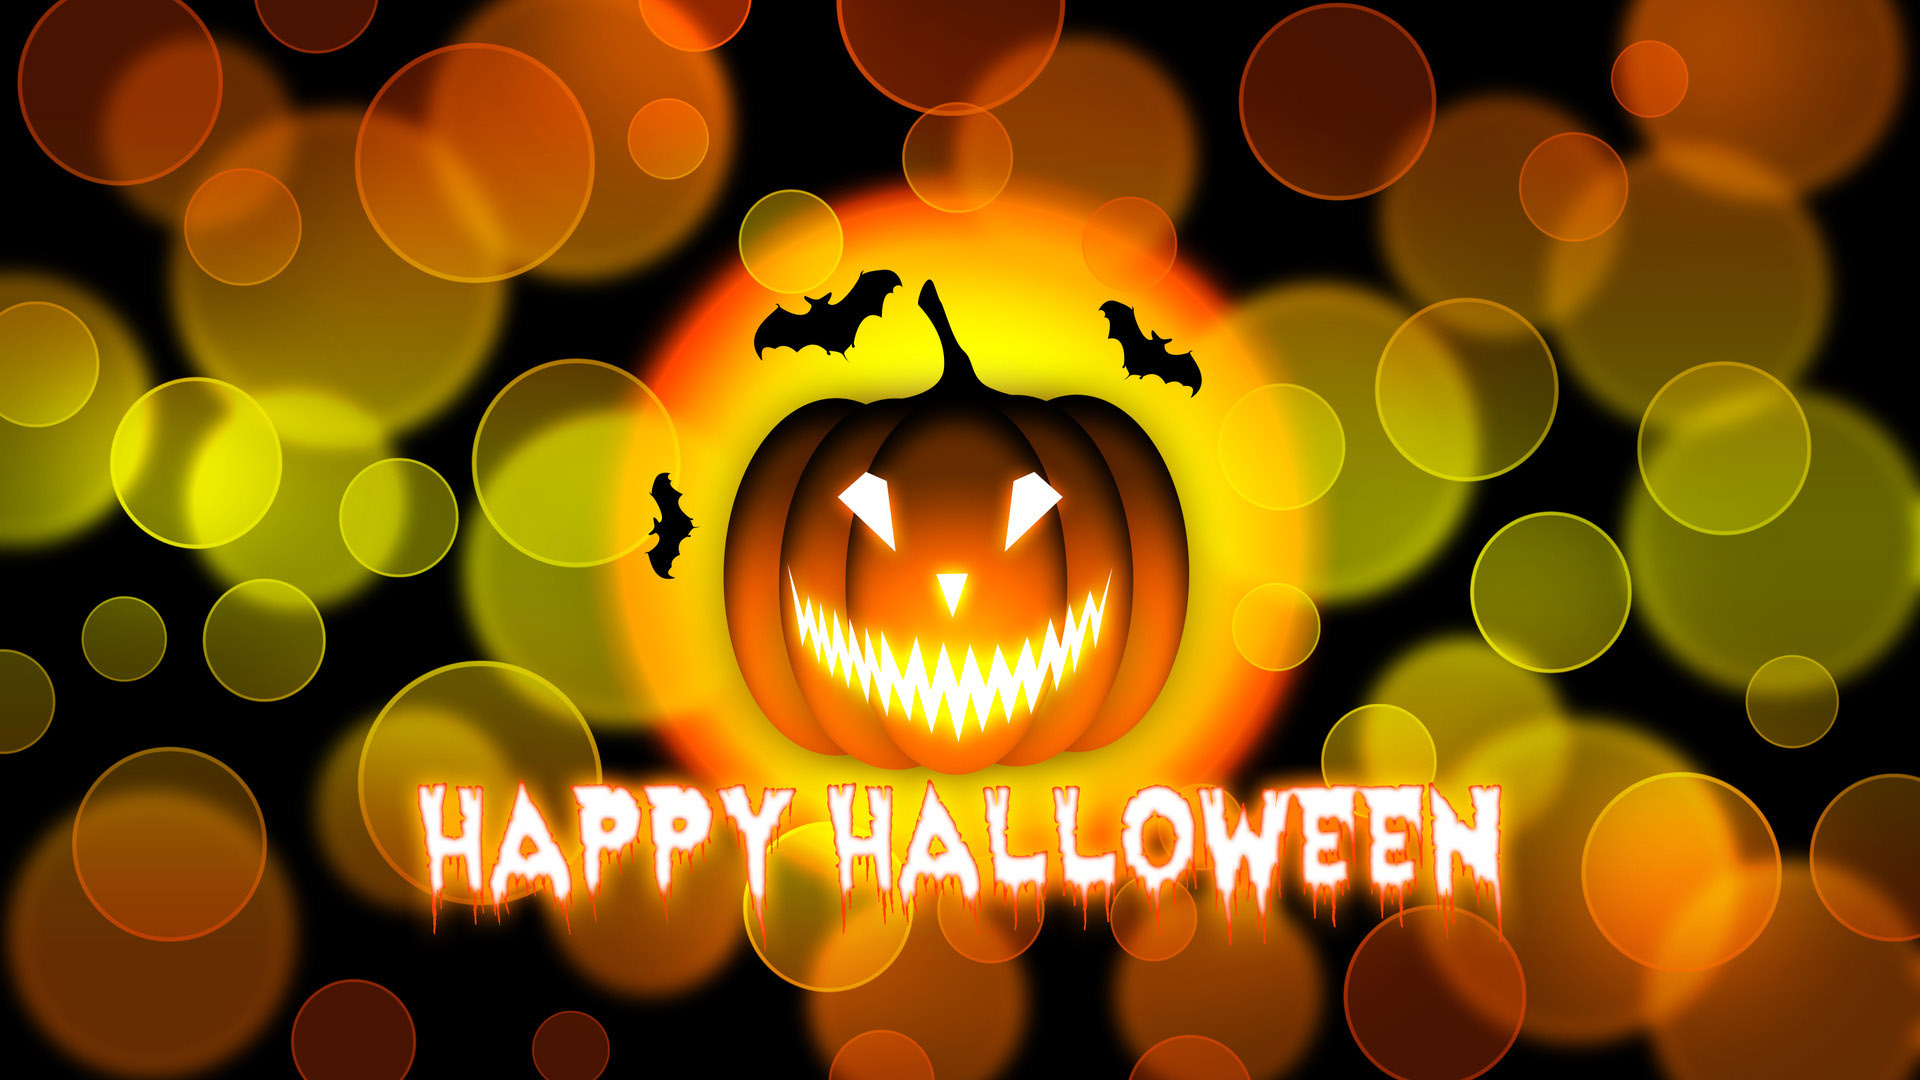 Happy Halloween Pumpkin for October Digital Signage